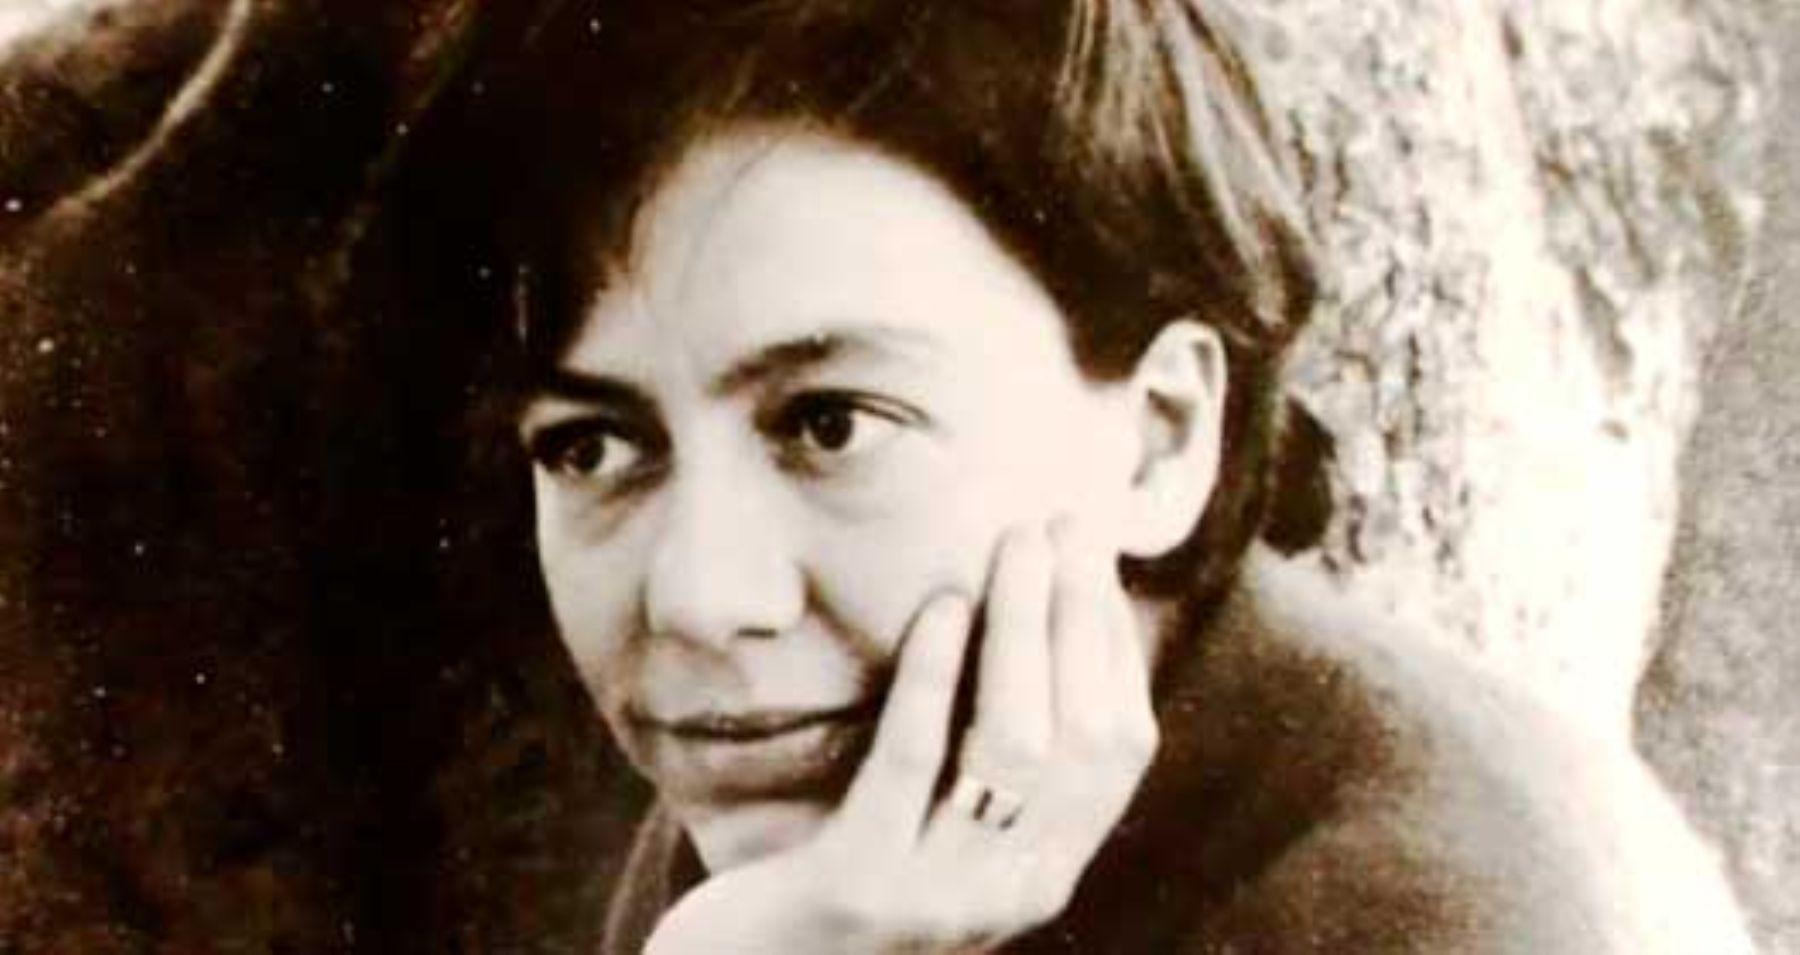 alejandra pizarnik 2